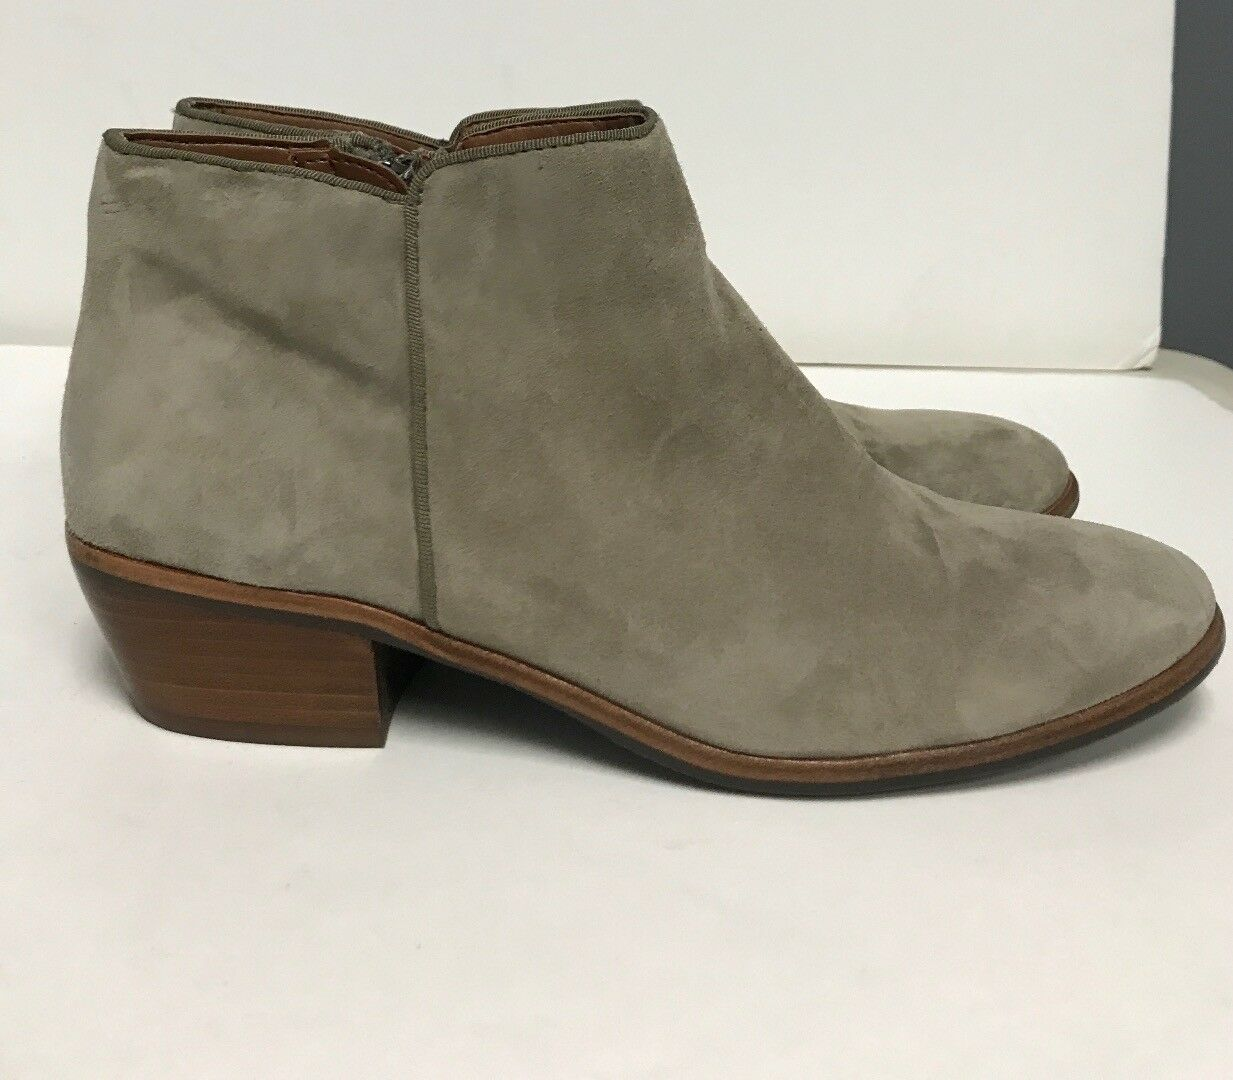 Sam Edelman Tobillo botas gris Topo Gamuza Cremallera Lados partes superiores de cuero Talle 8 B4038